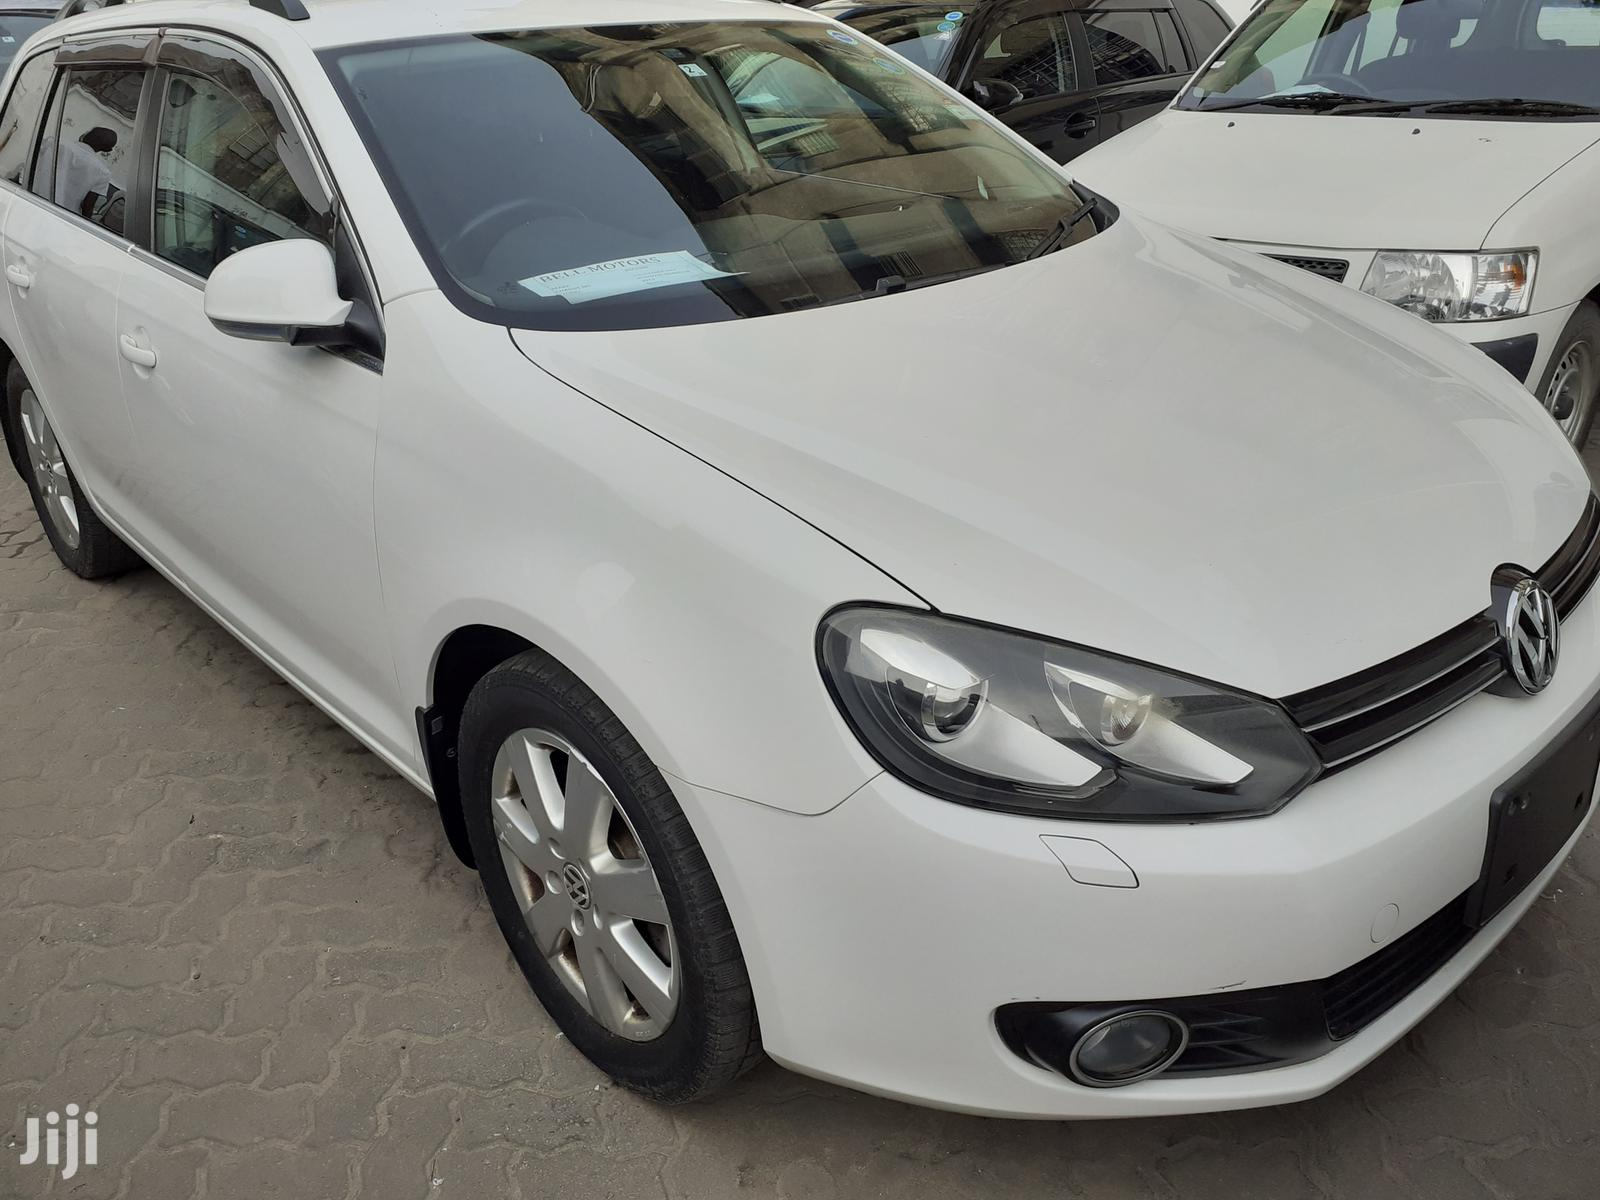 Archive: New Volkswagen Golf 2013 White